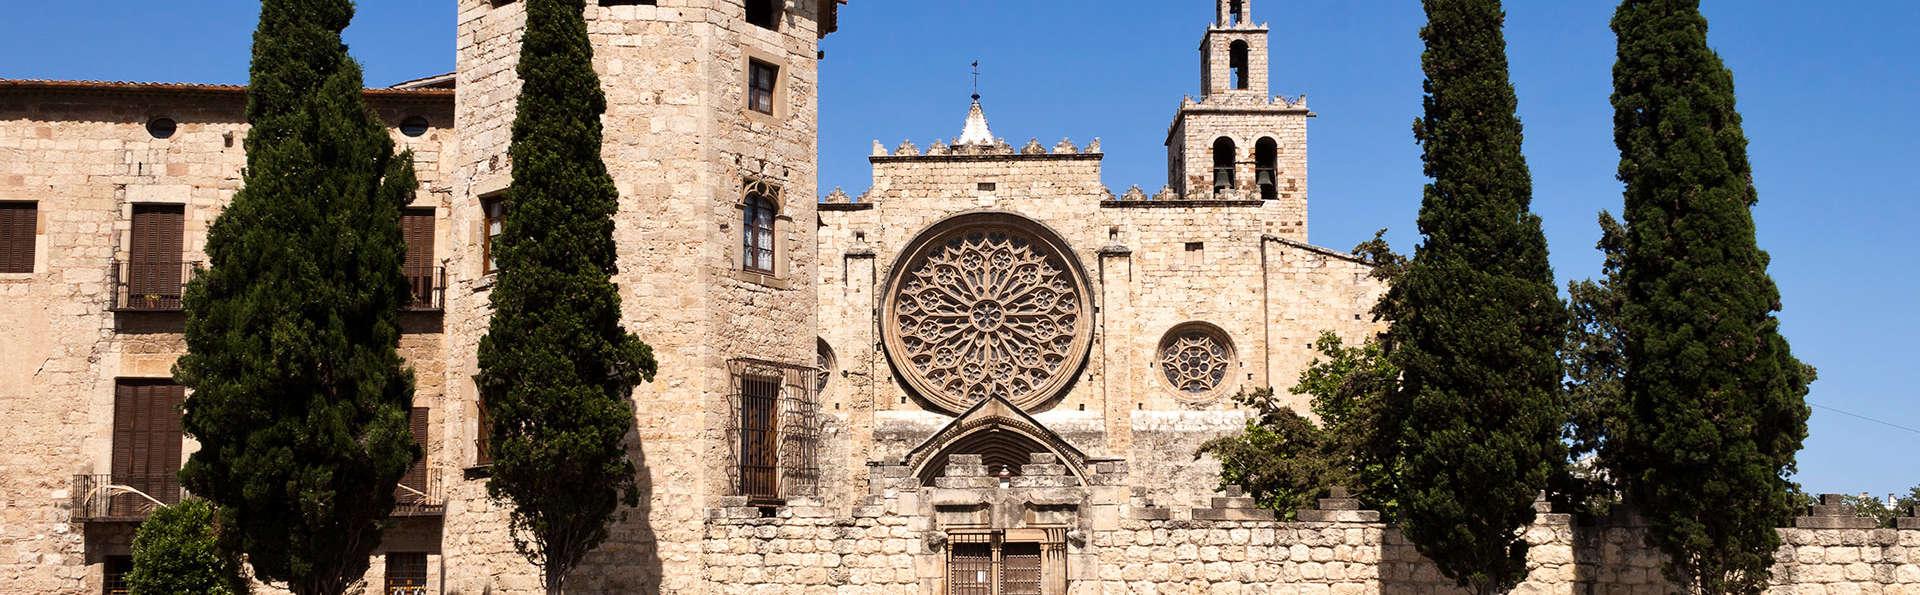 Bluebay city barcelona sant cugat 4 sant cugat del vall s espa a - Spa sant cugat ...